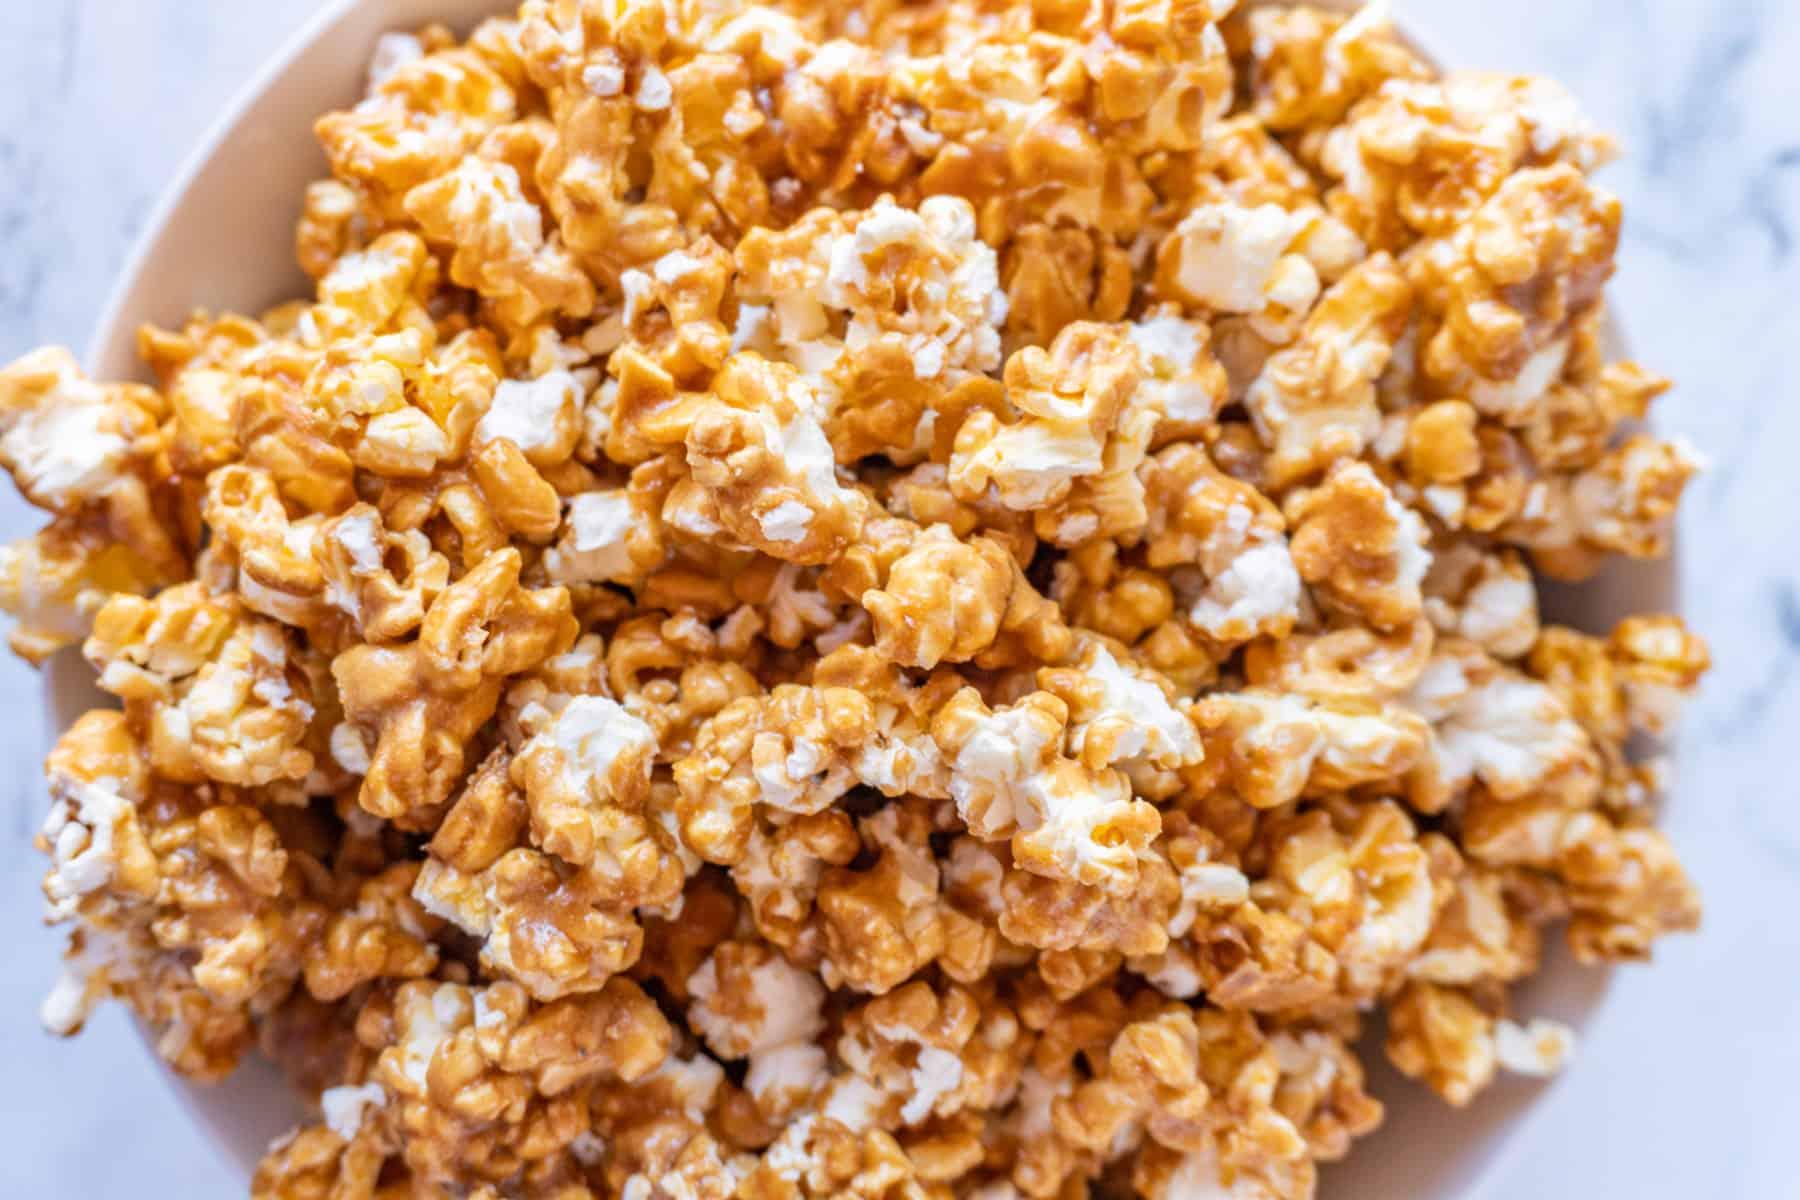 caramel popcorn in large bowl overhead shot